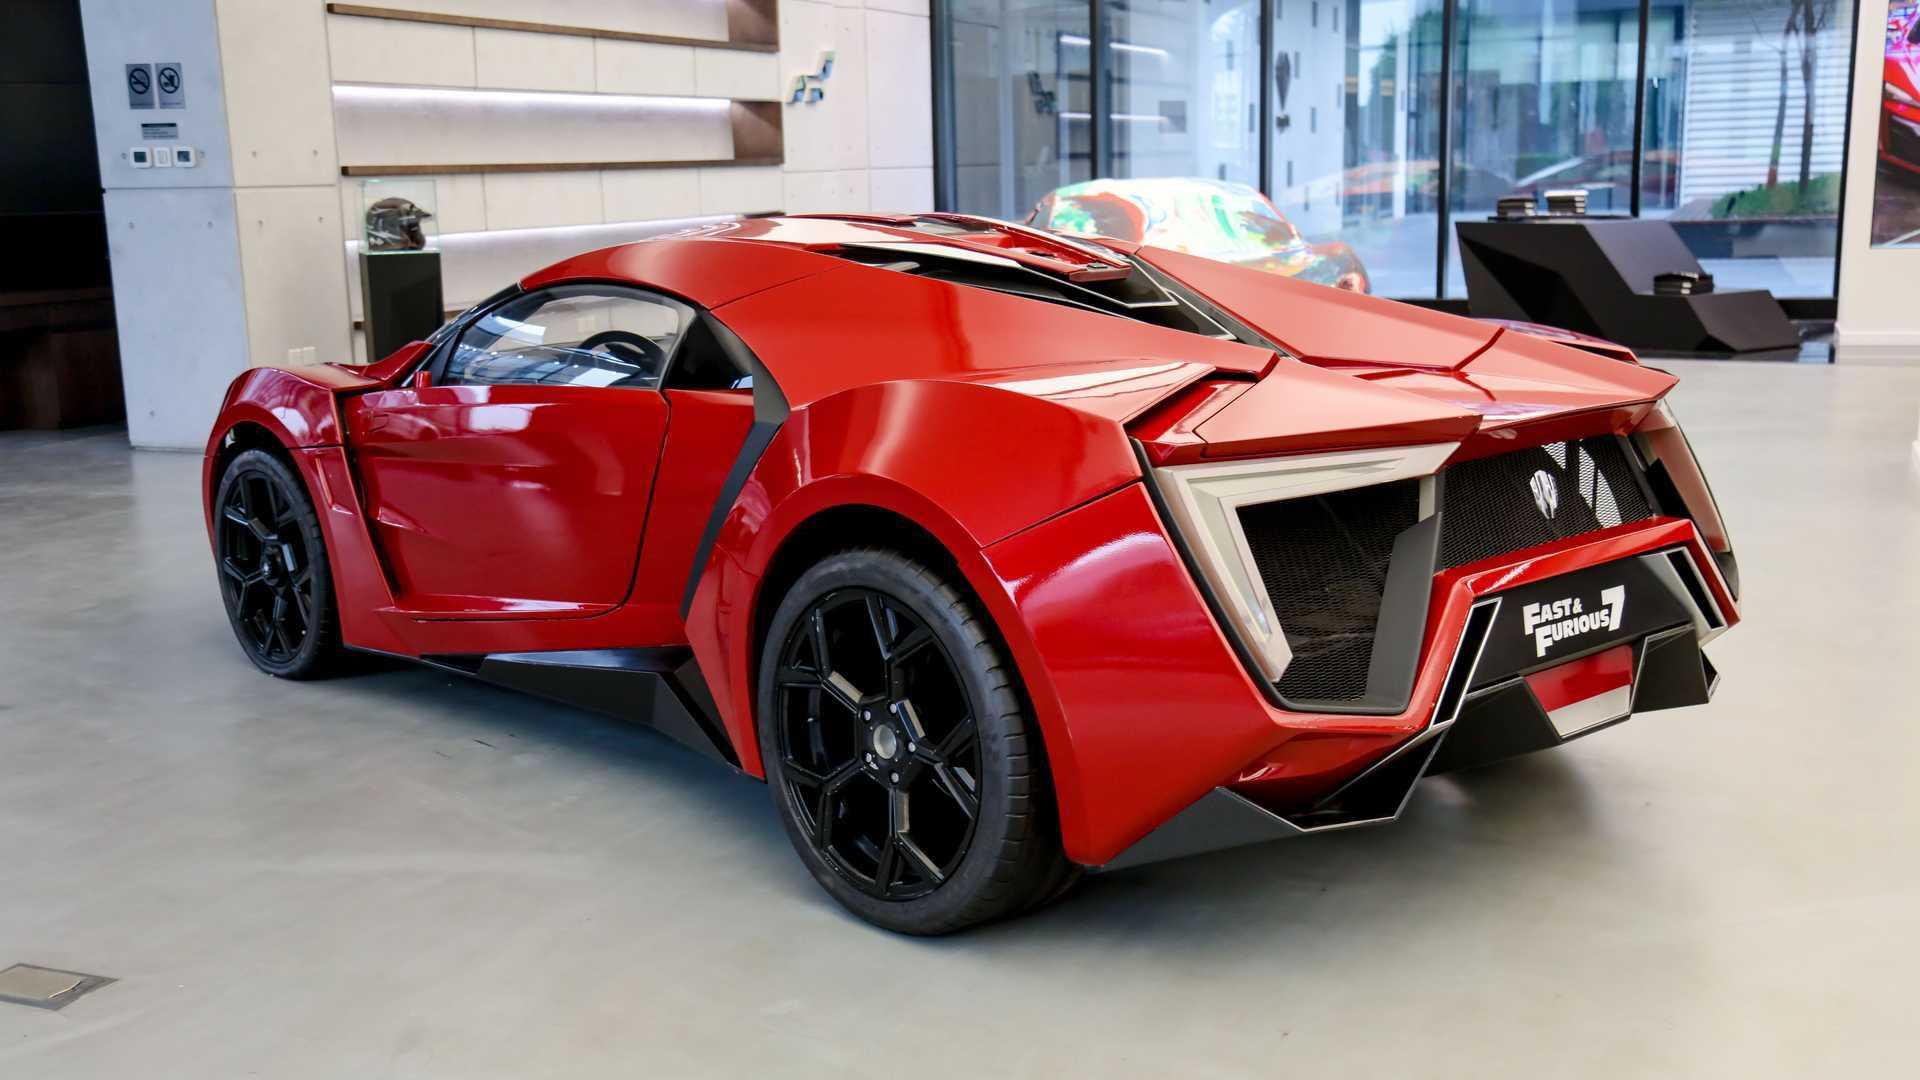 Lykan_HyperSport_stunt_car_sale-0005